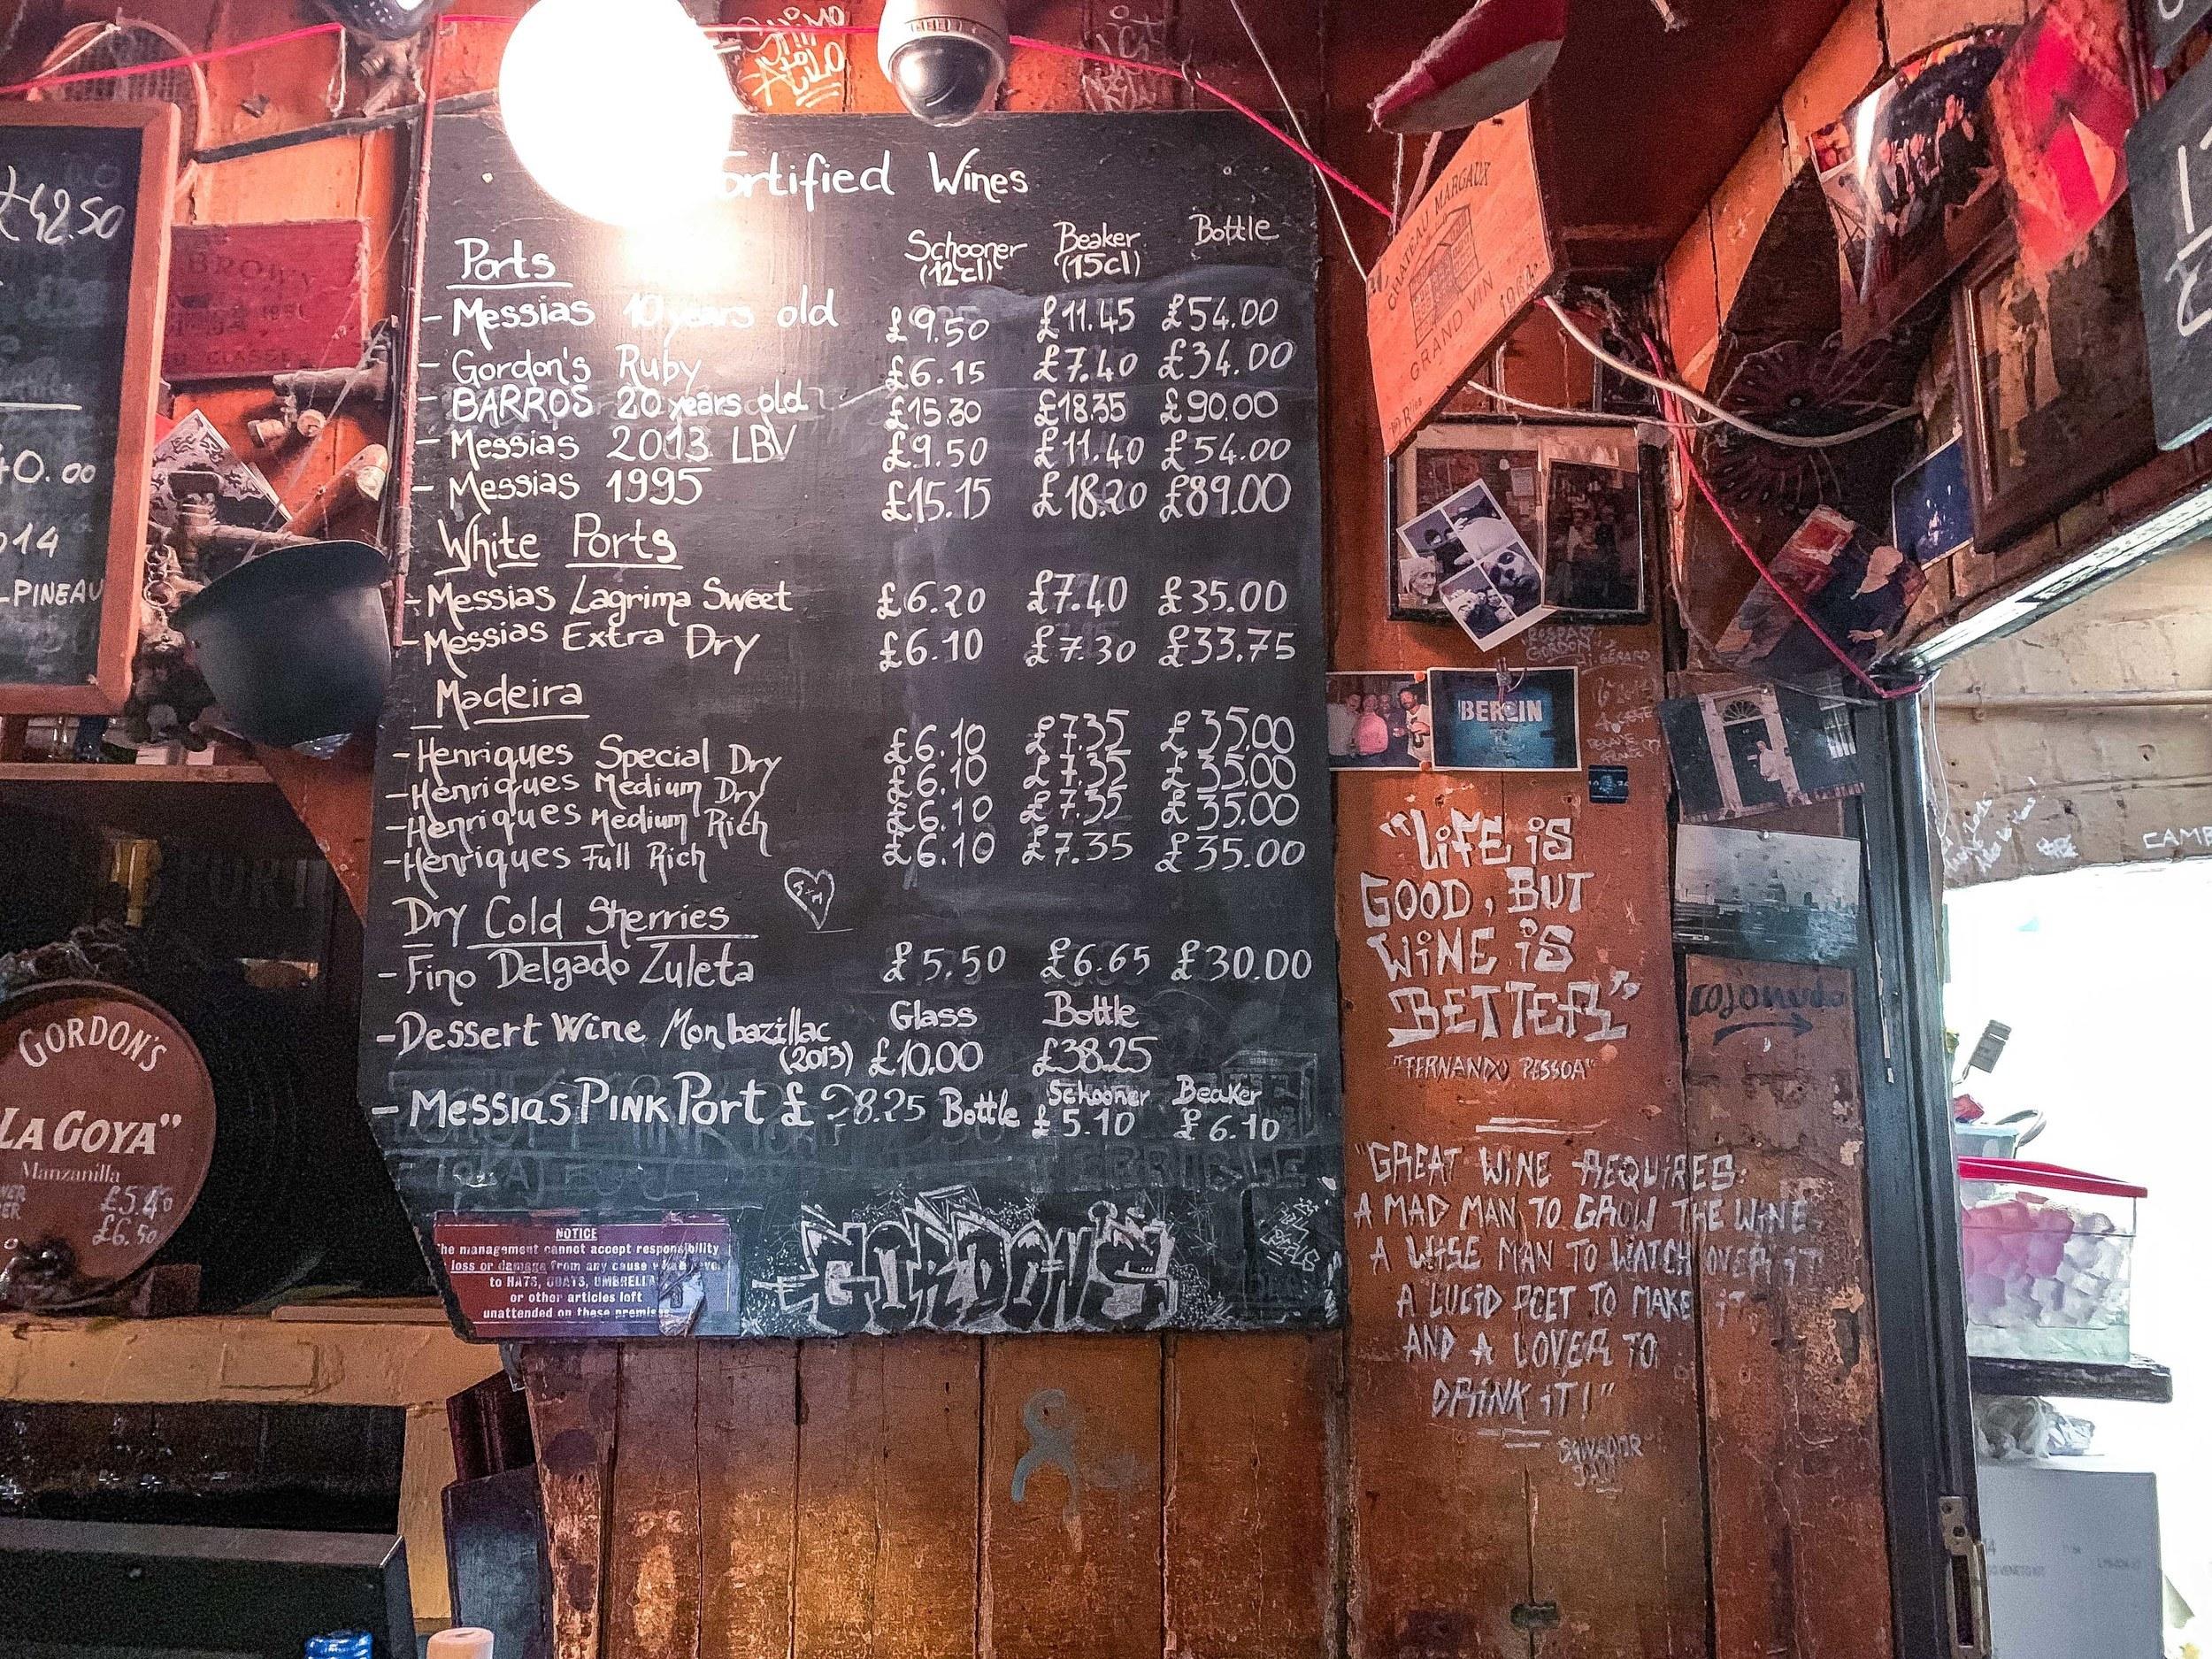 Gordon's Wine Bar: Wine in London's Candlelit Vaulted Cellar near Embankment, London, England